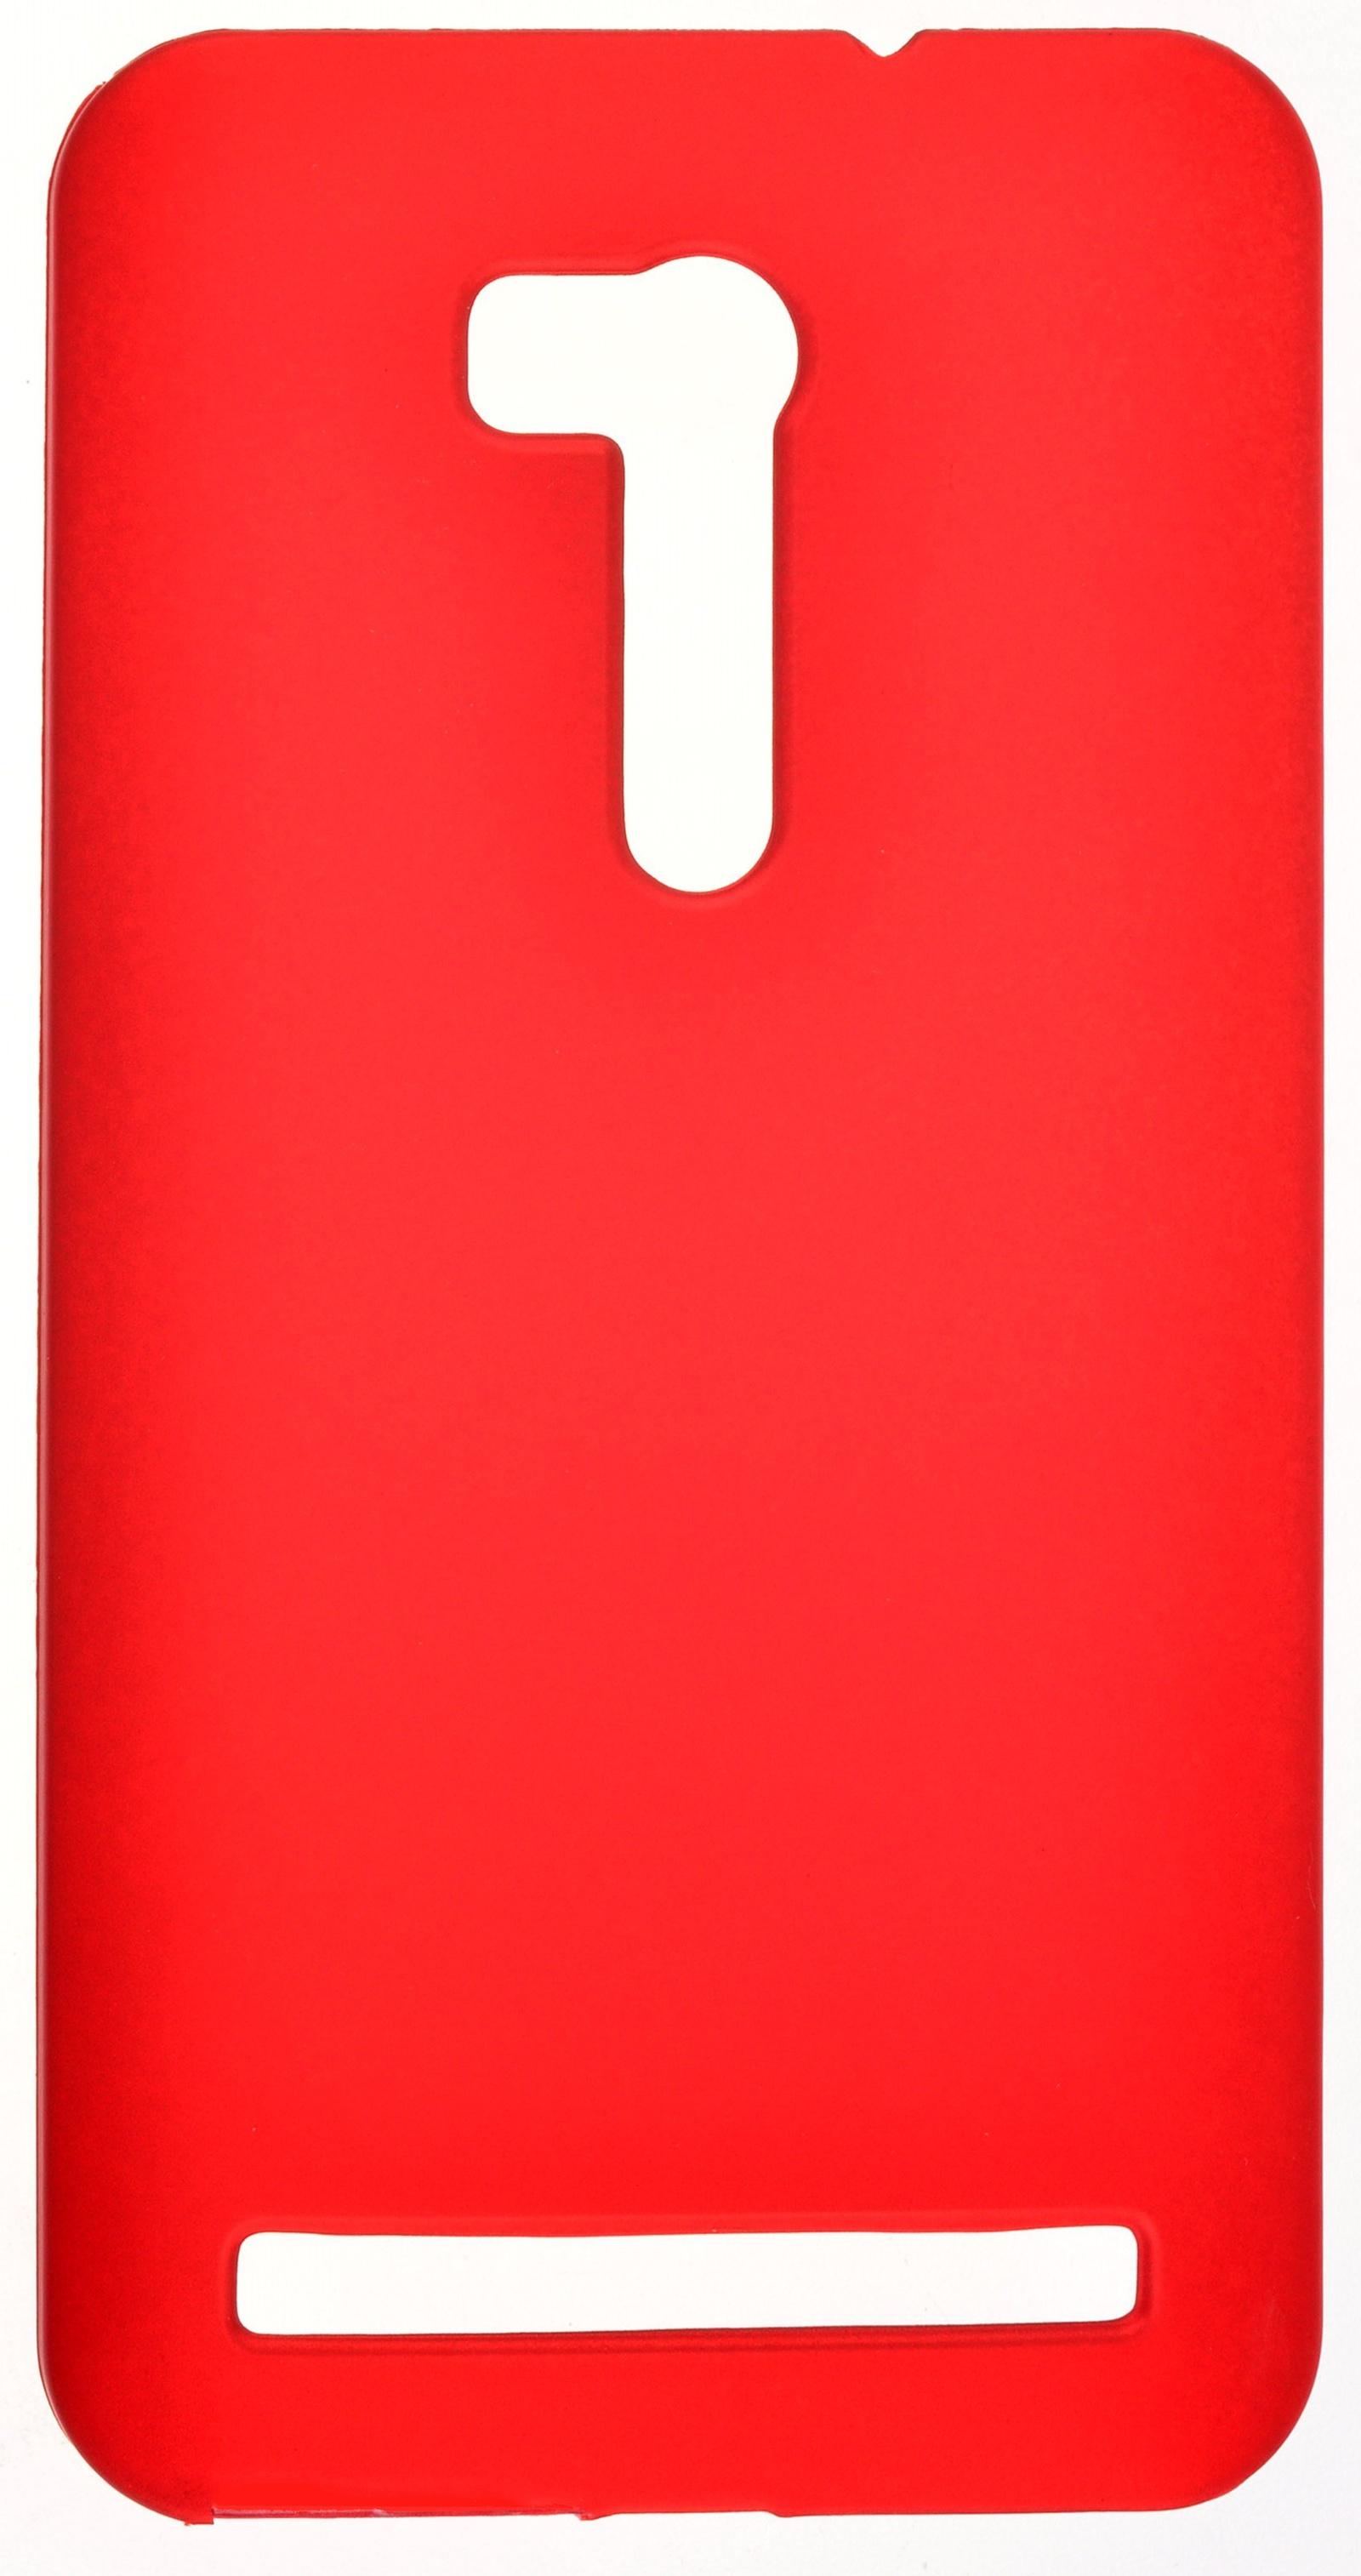 Накладка skinBOX для ZB551KL/G550KL, 2000000092522, красный форма для запекания мфк профит сабина овальная 30 х 20 5 х 5 см